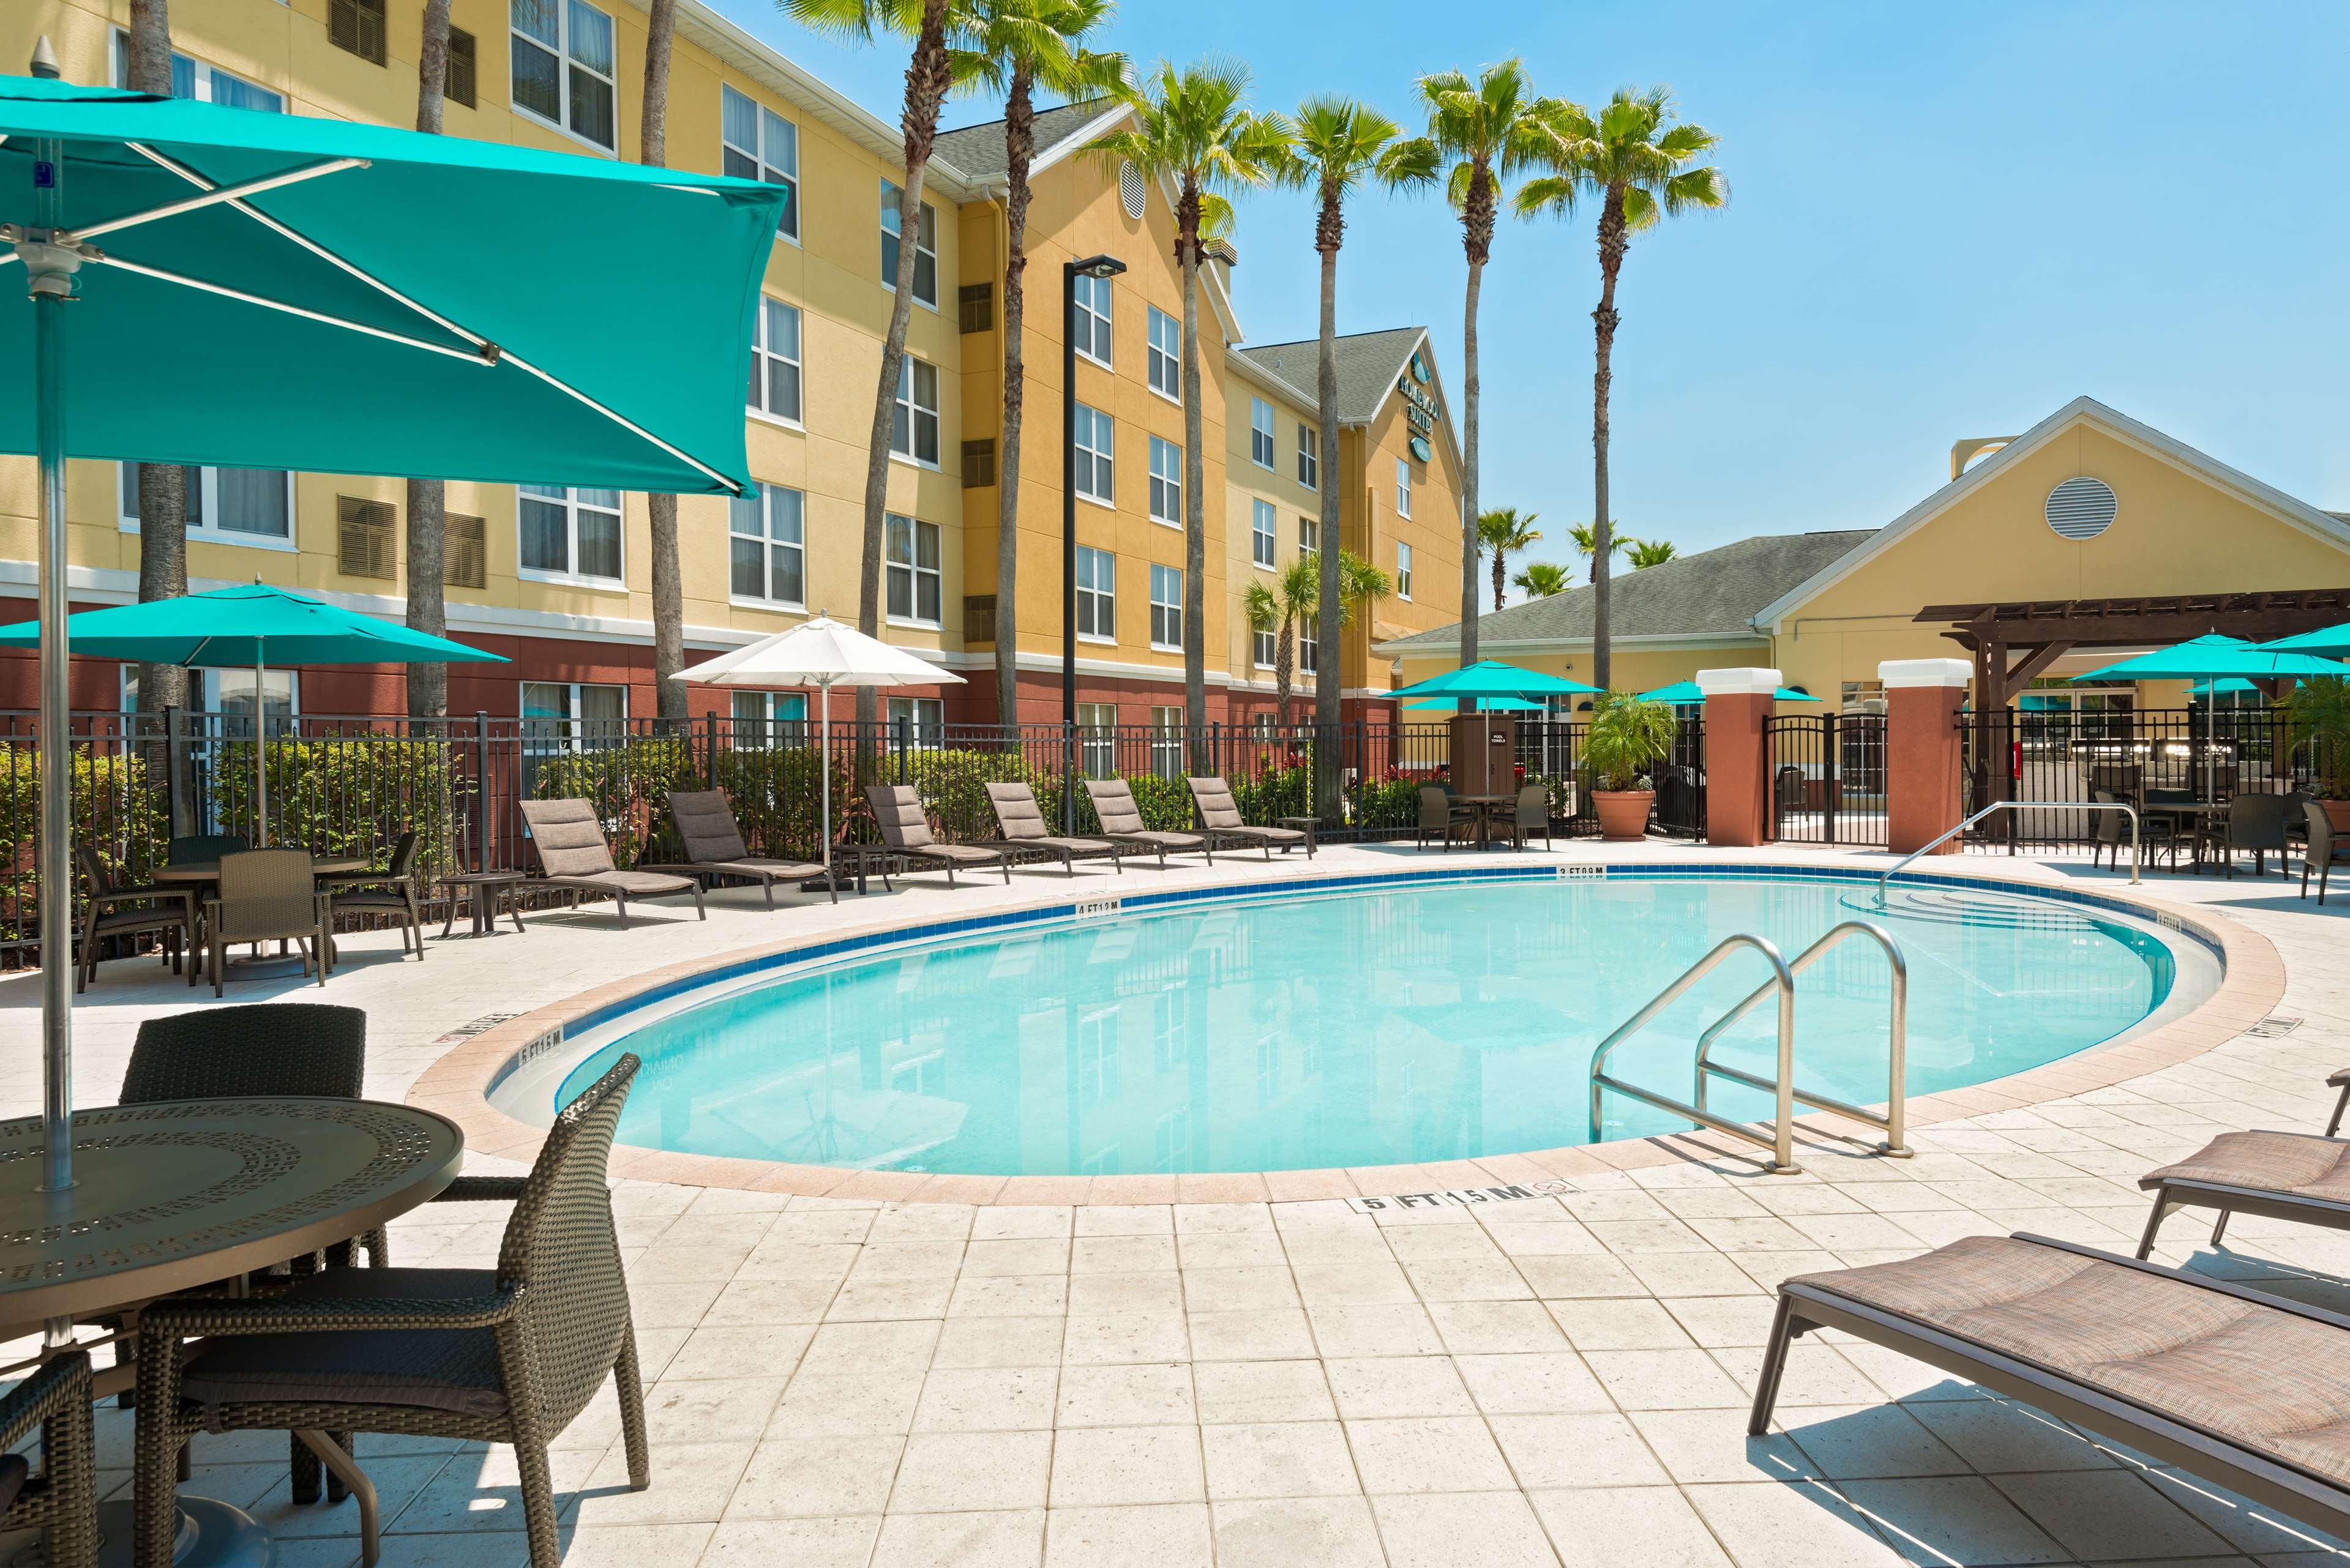 Homewood Suites by Hilton Orlando-UCF Area image 6